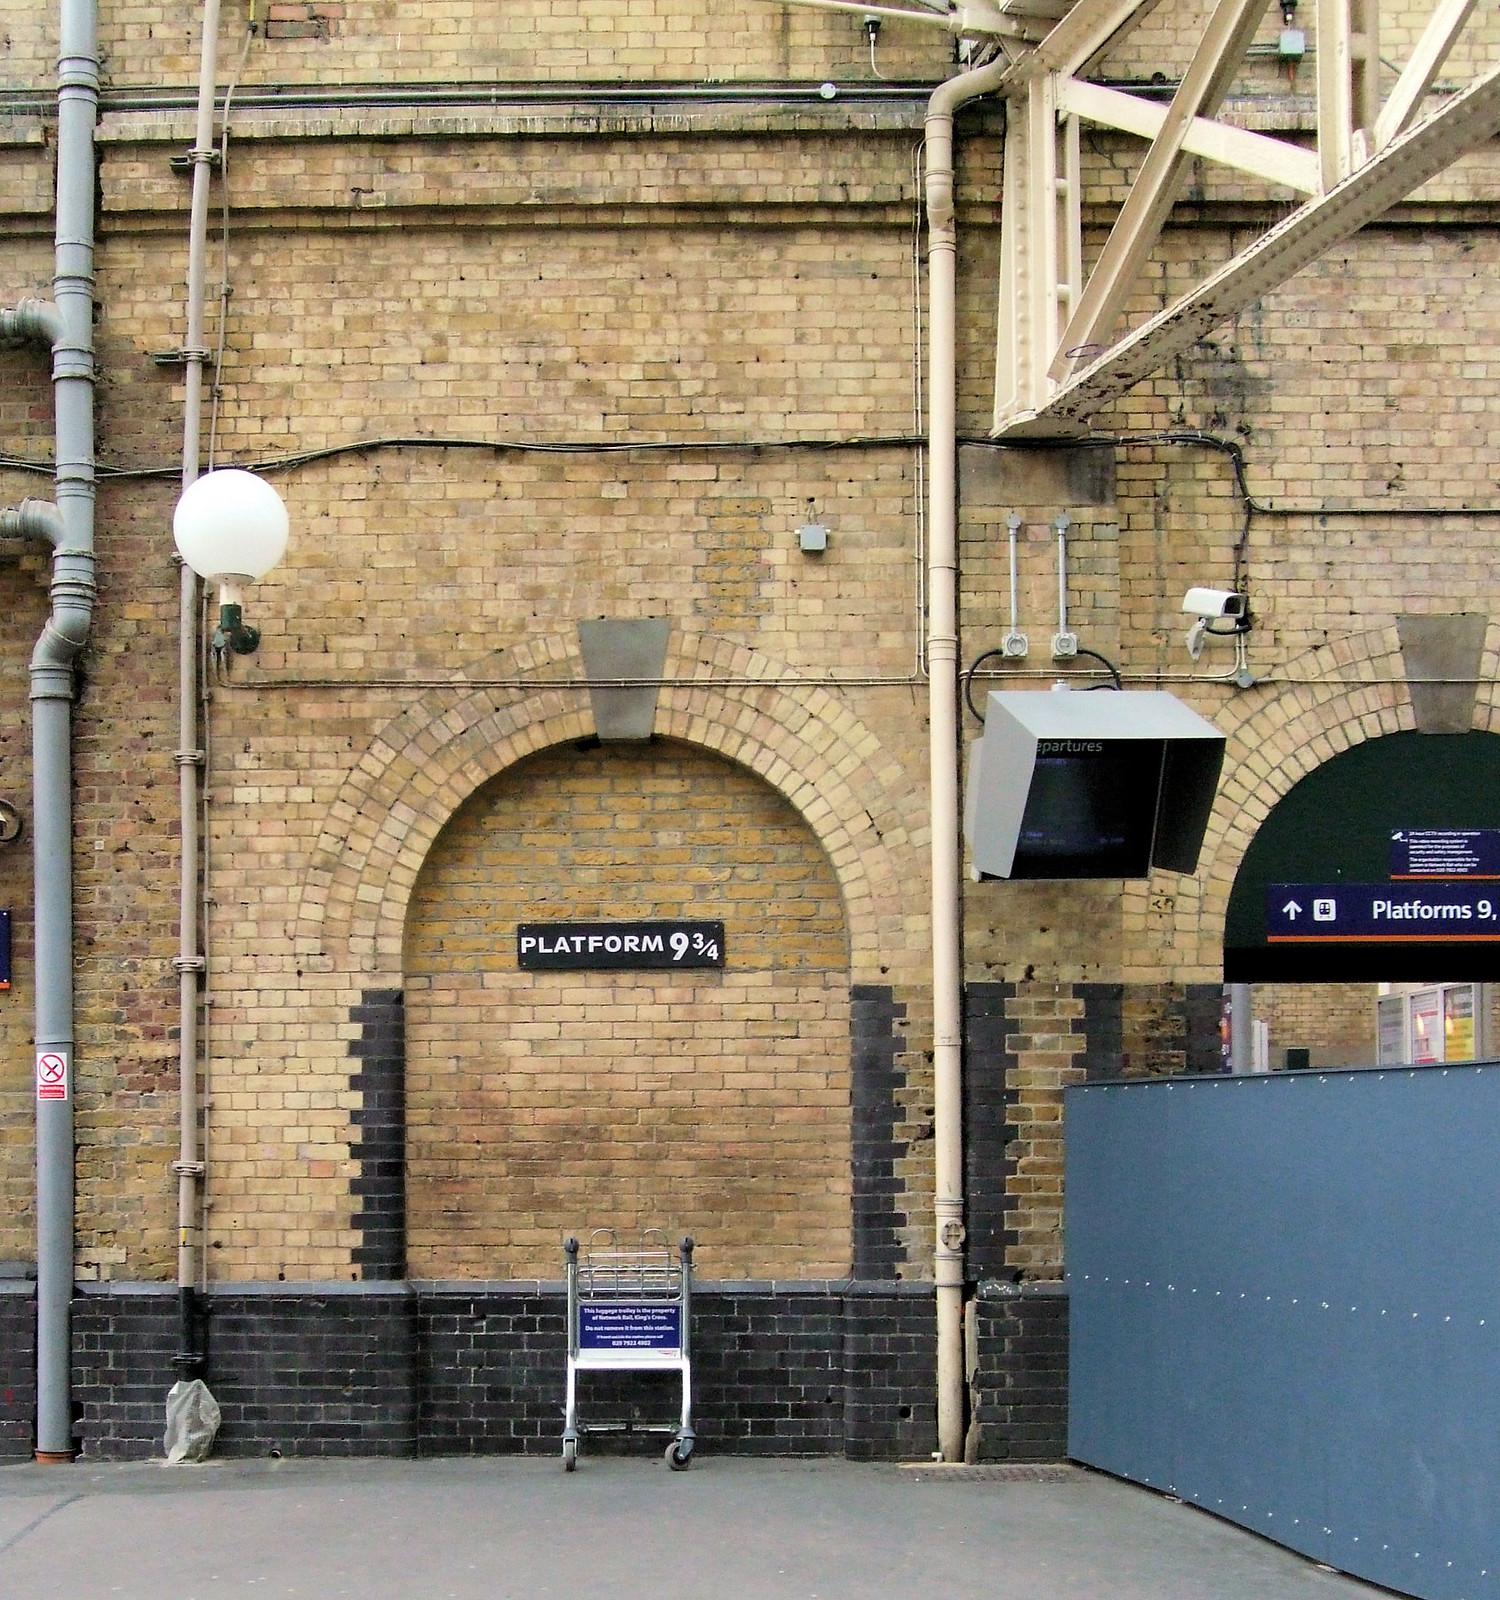 Platform 9¾,  Kings Cross Station, London.